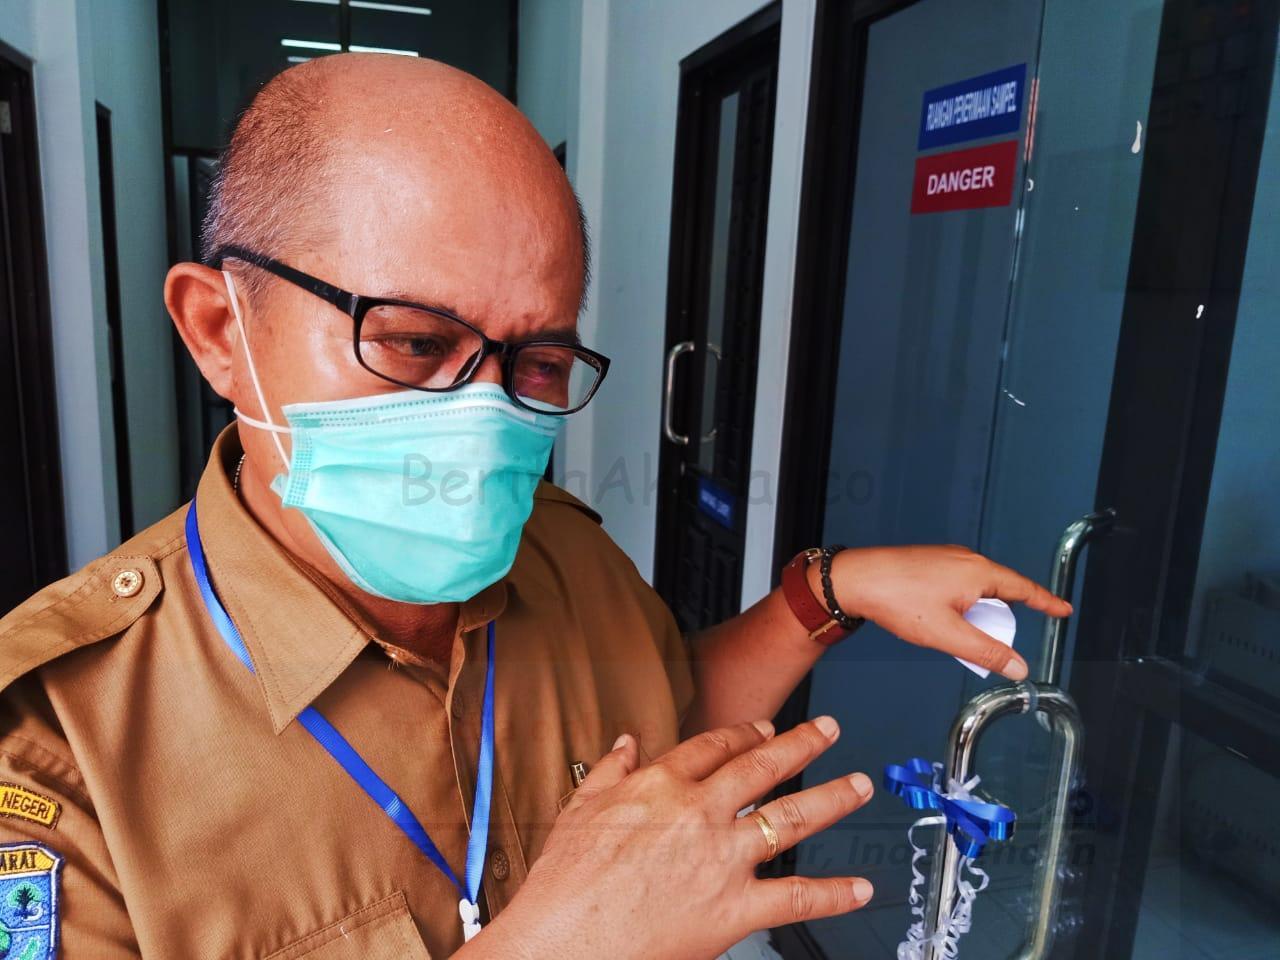 Henri Sembiring: Instruksi Batas Aktivitas Pelaku Usaha di Manokwari Telah Direvisi 23 IMG 20200928 WA0035